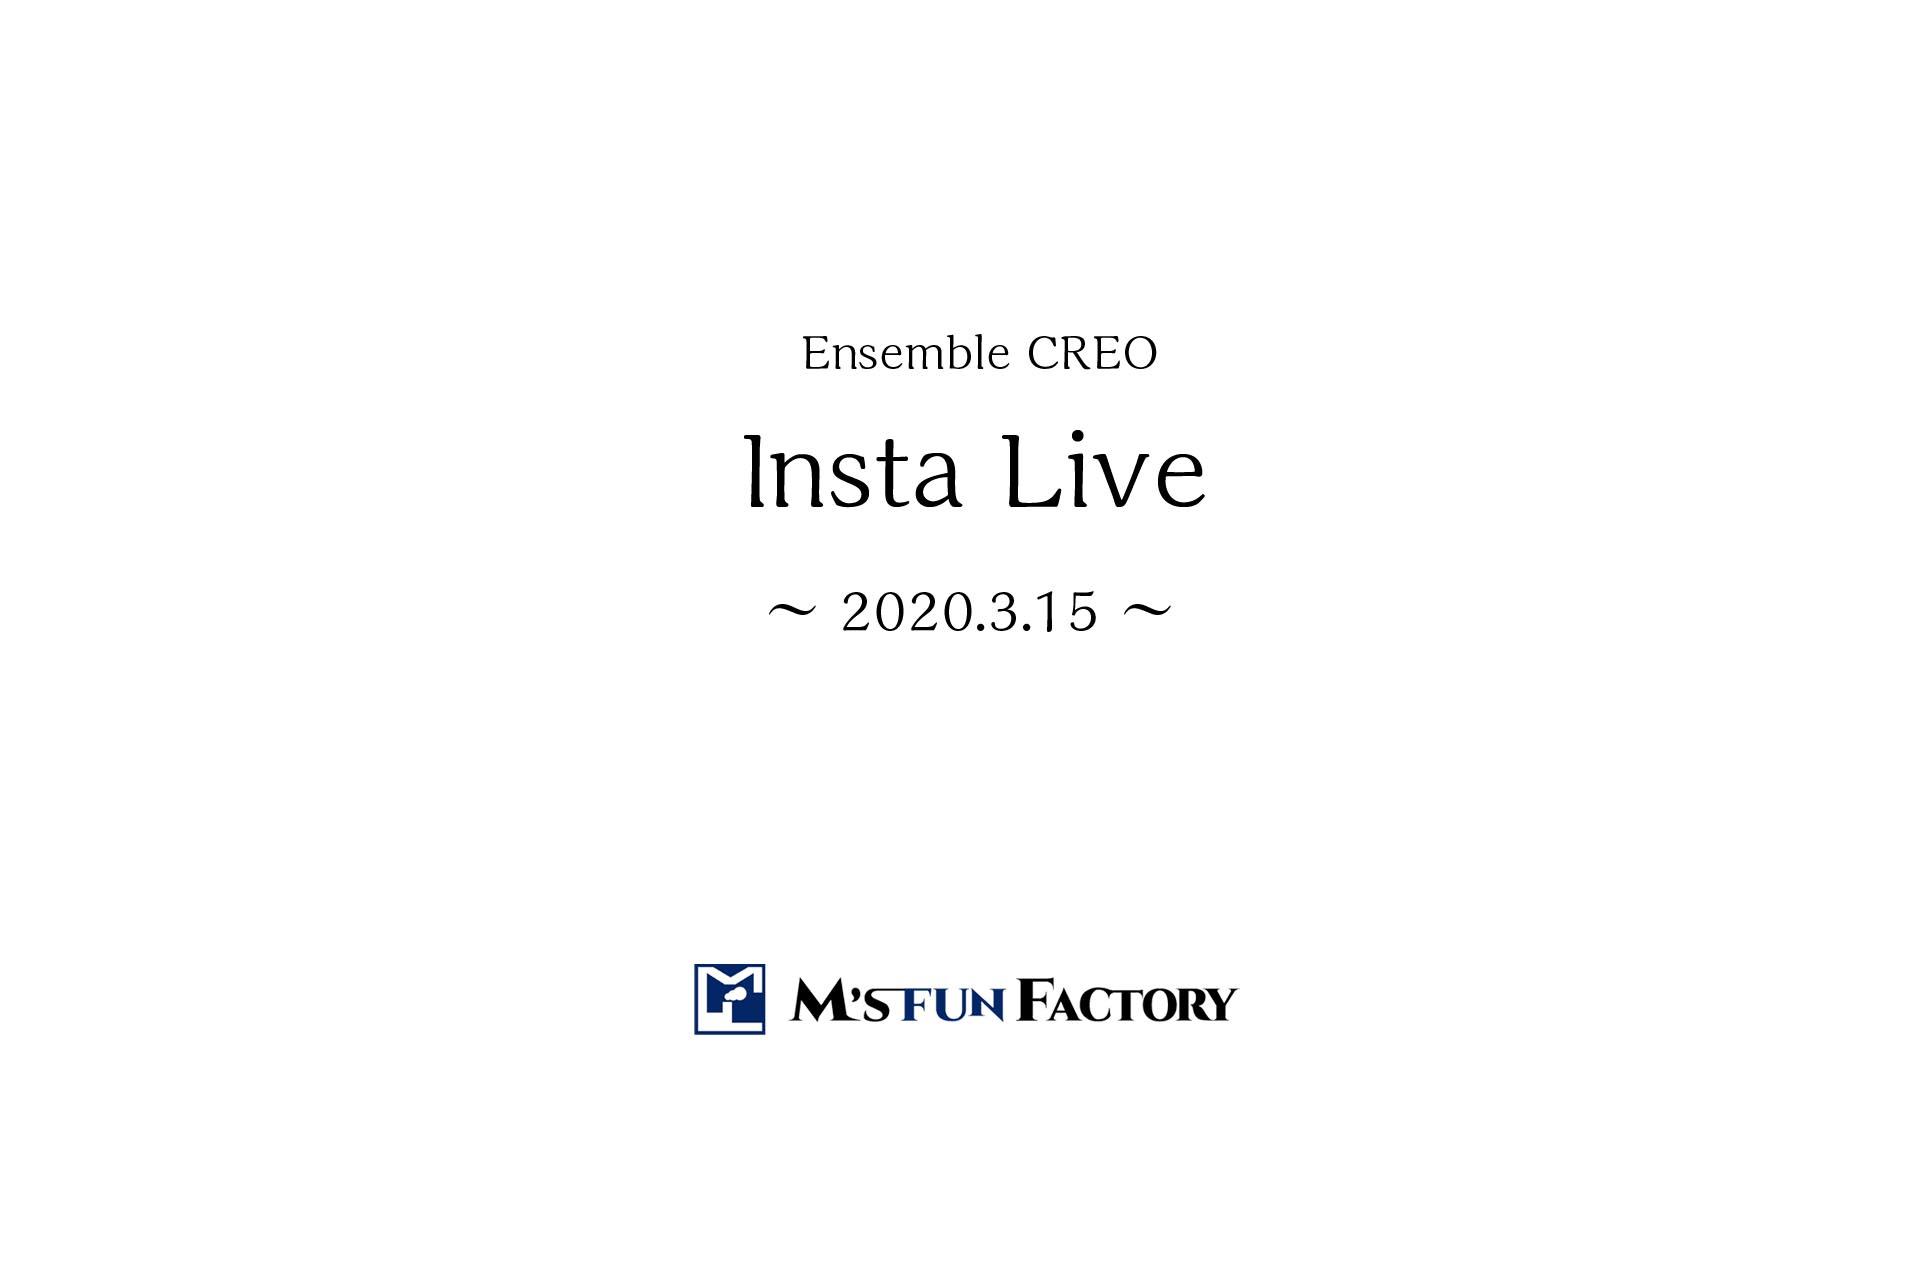 instalive_本番new